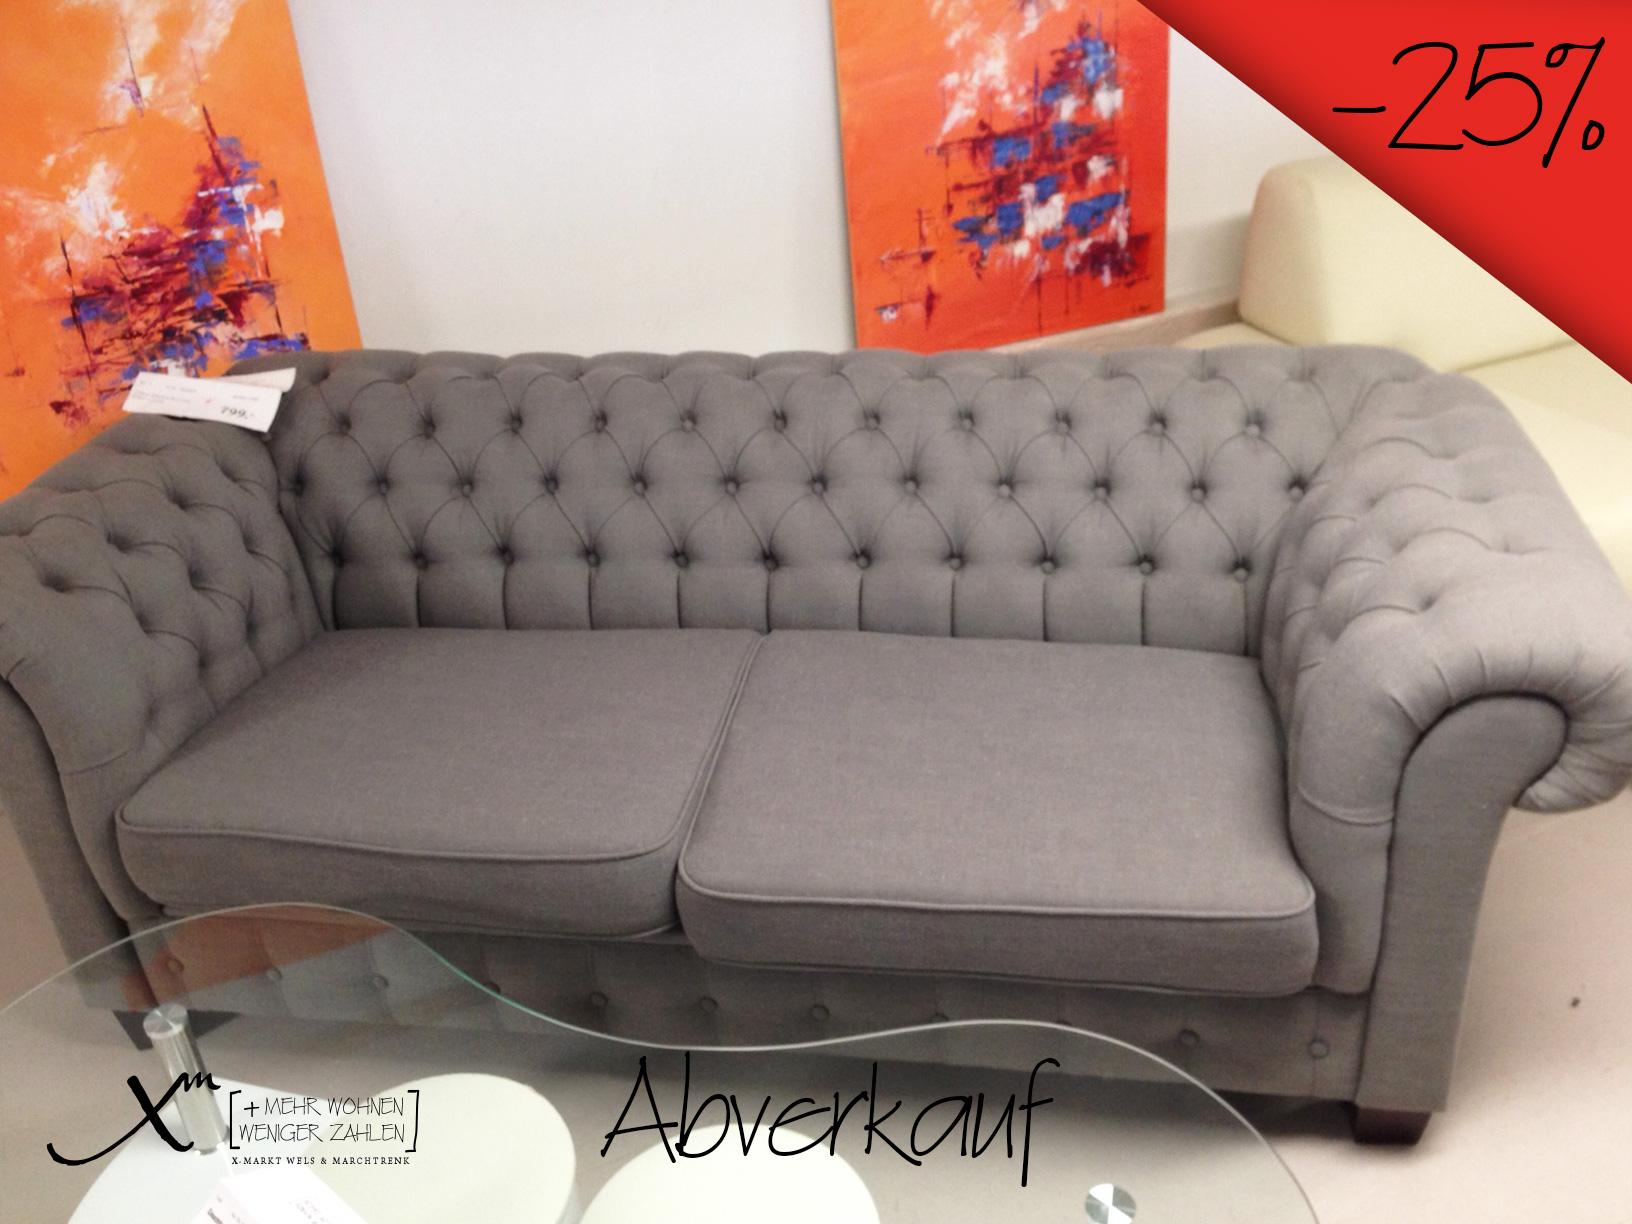 Chesterfield Lounge Sessel ~ Abverkauf chesterfield wels verkauft markt